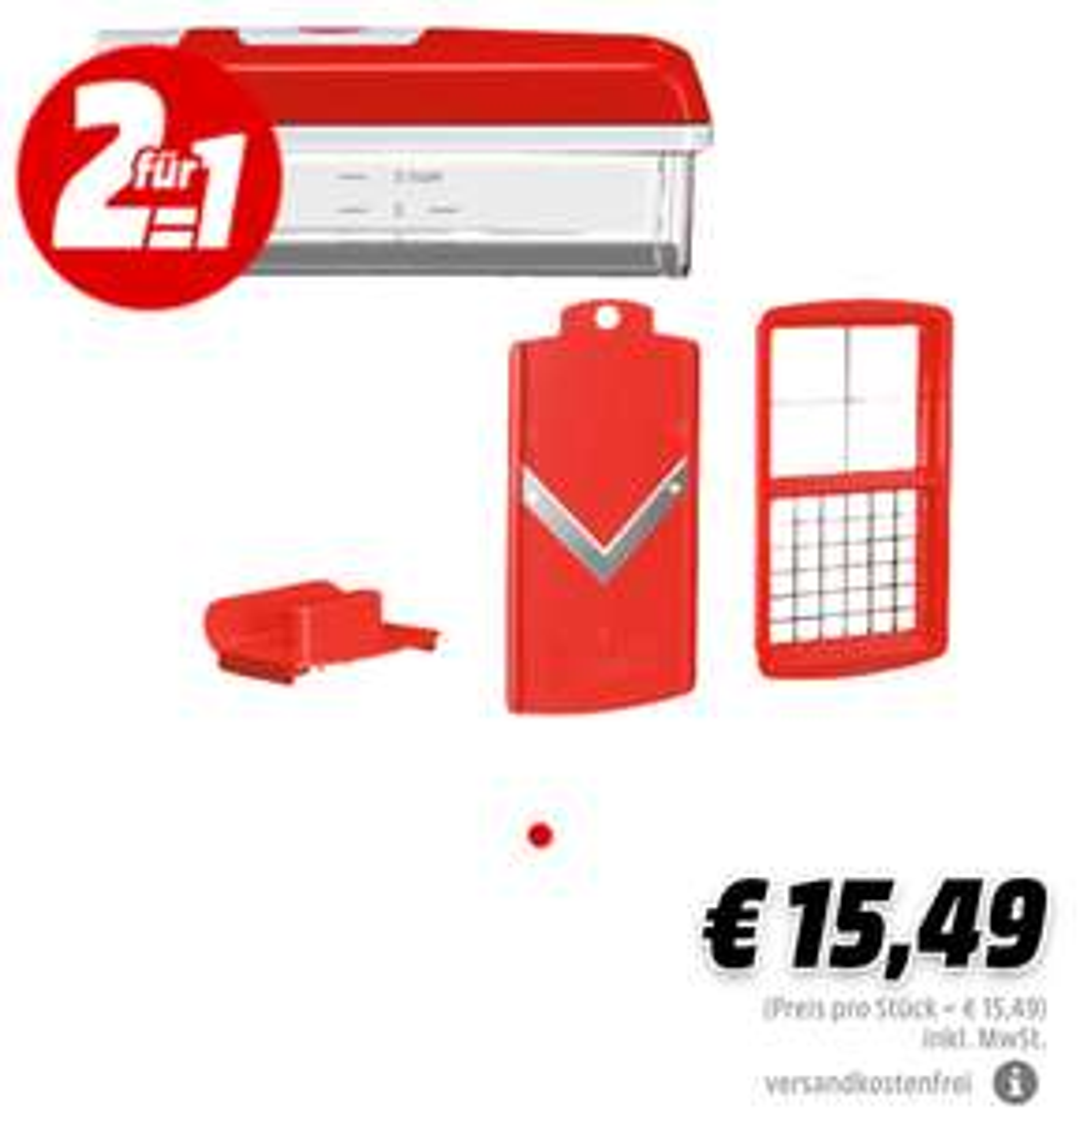 2x GENIUS Nicer Dicer Plus Kompakt 5-tlg (7,75 pro Stück)